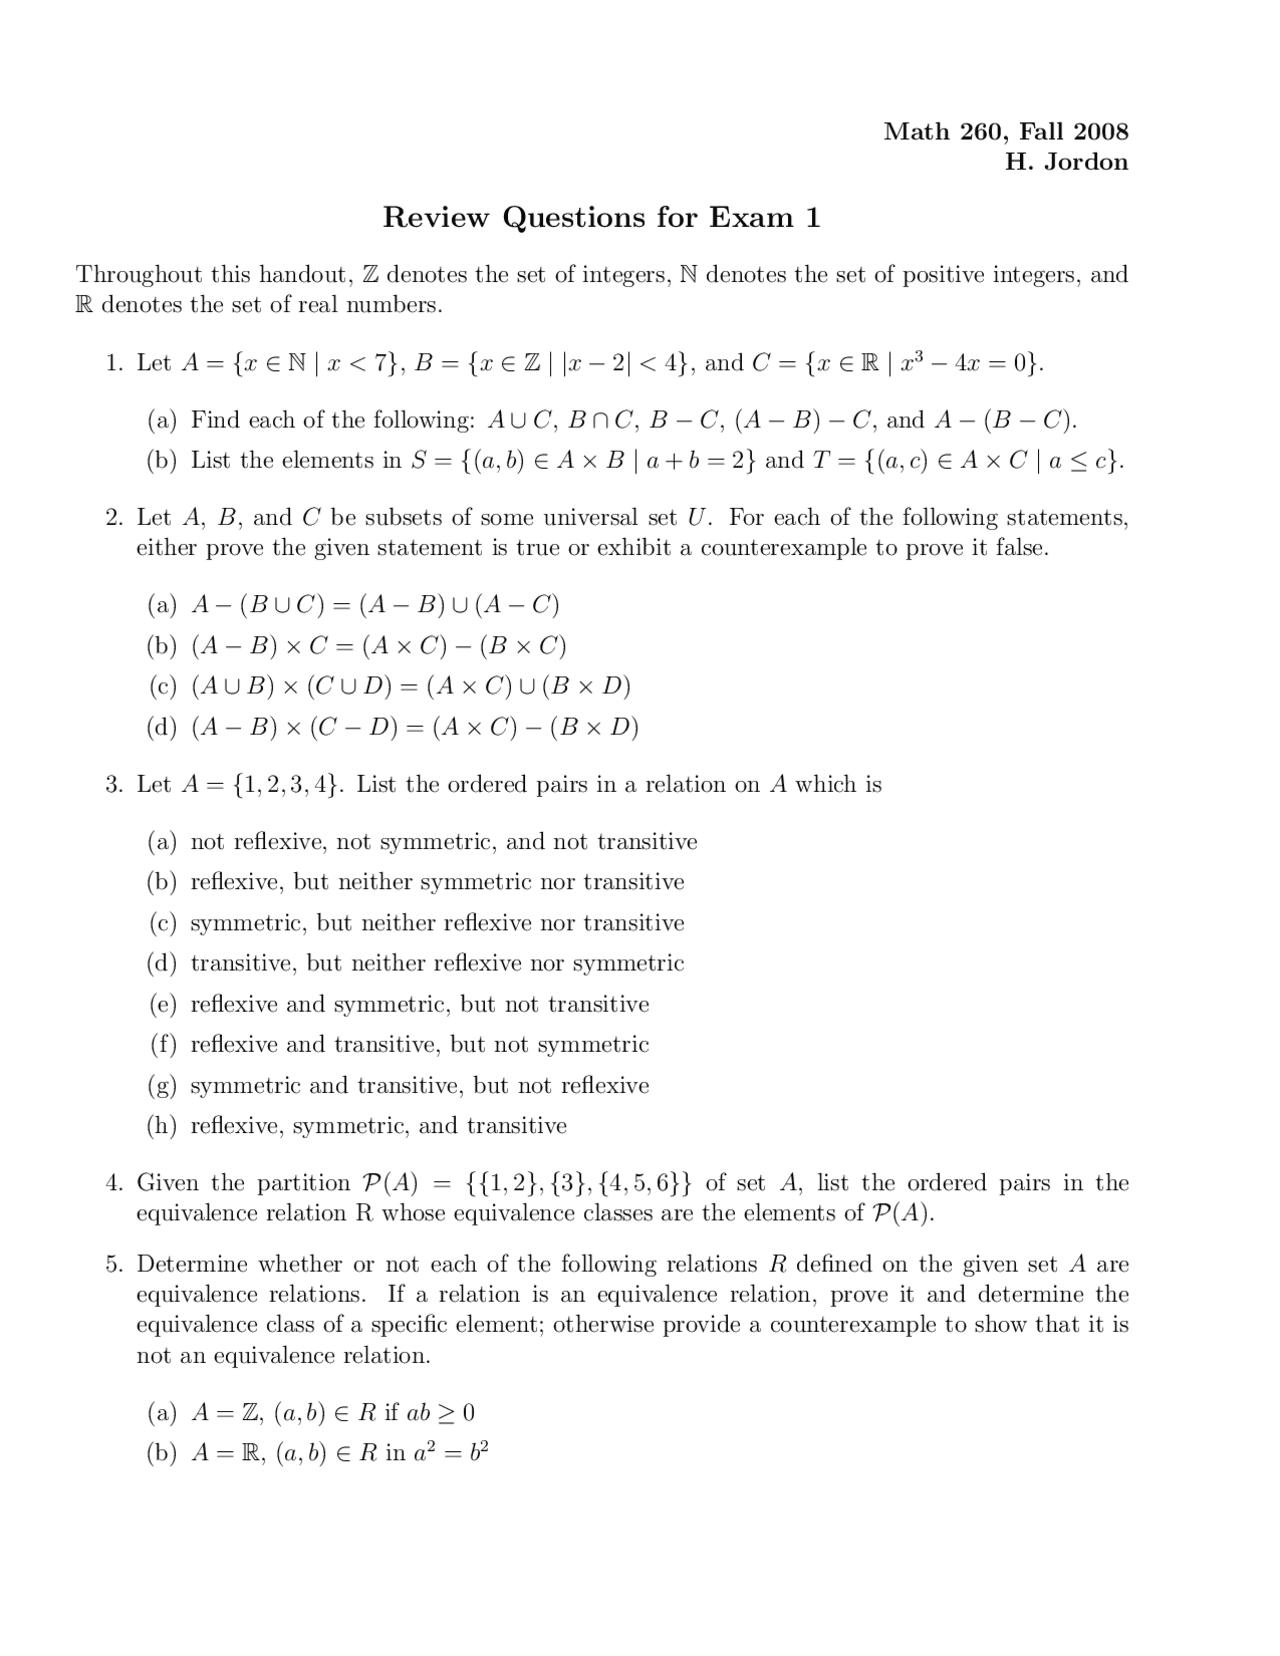 Review Questions For Exam 1 Discrete Mathematics Mat 260 00 Docsity